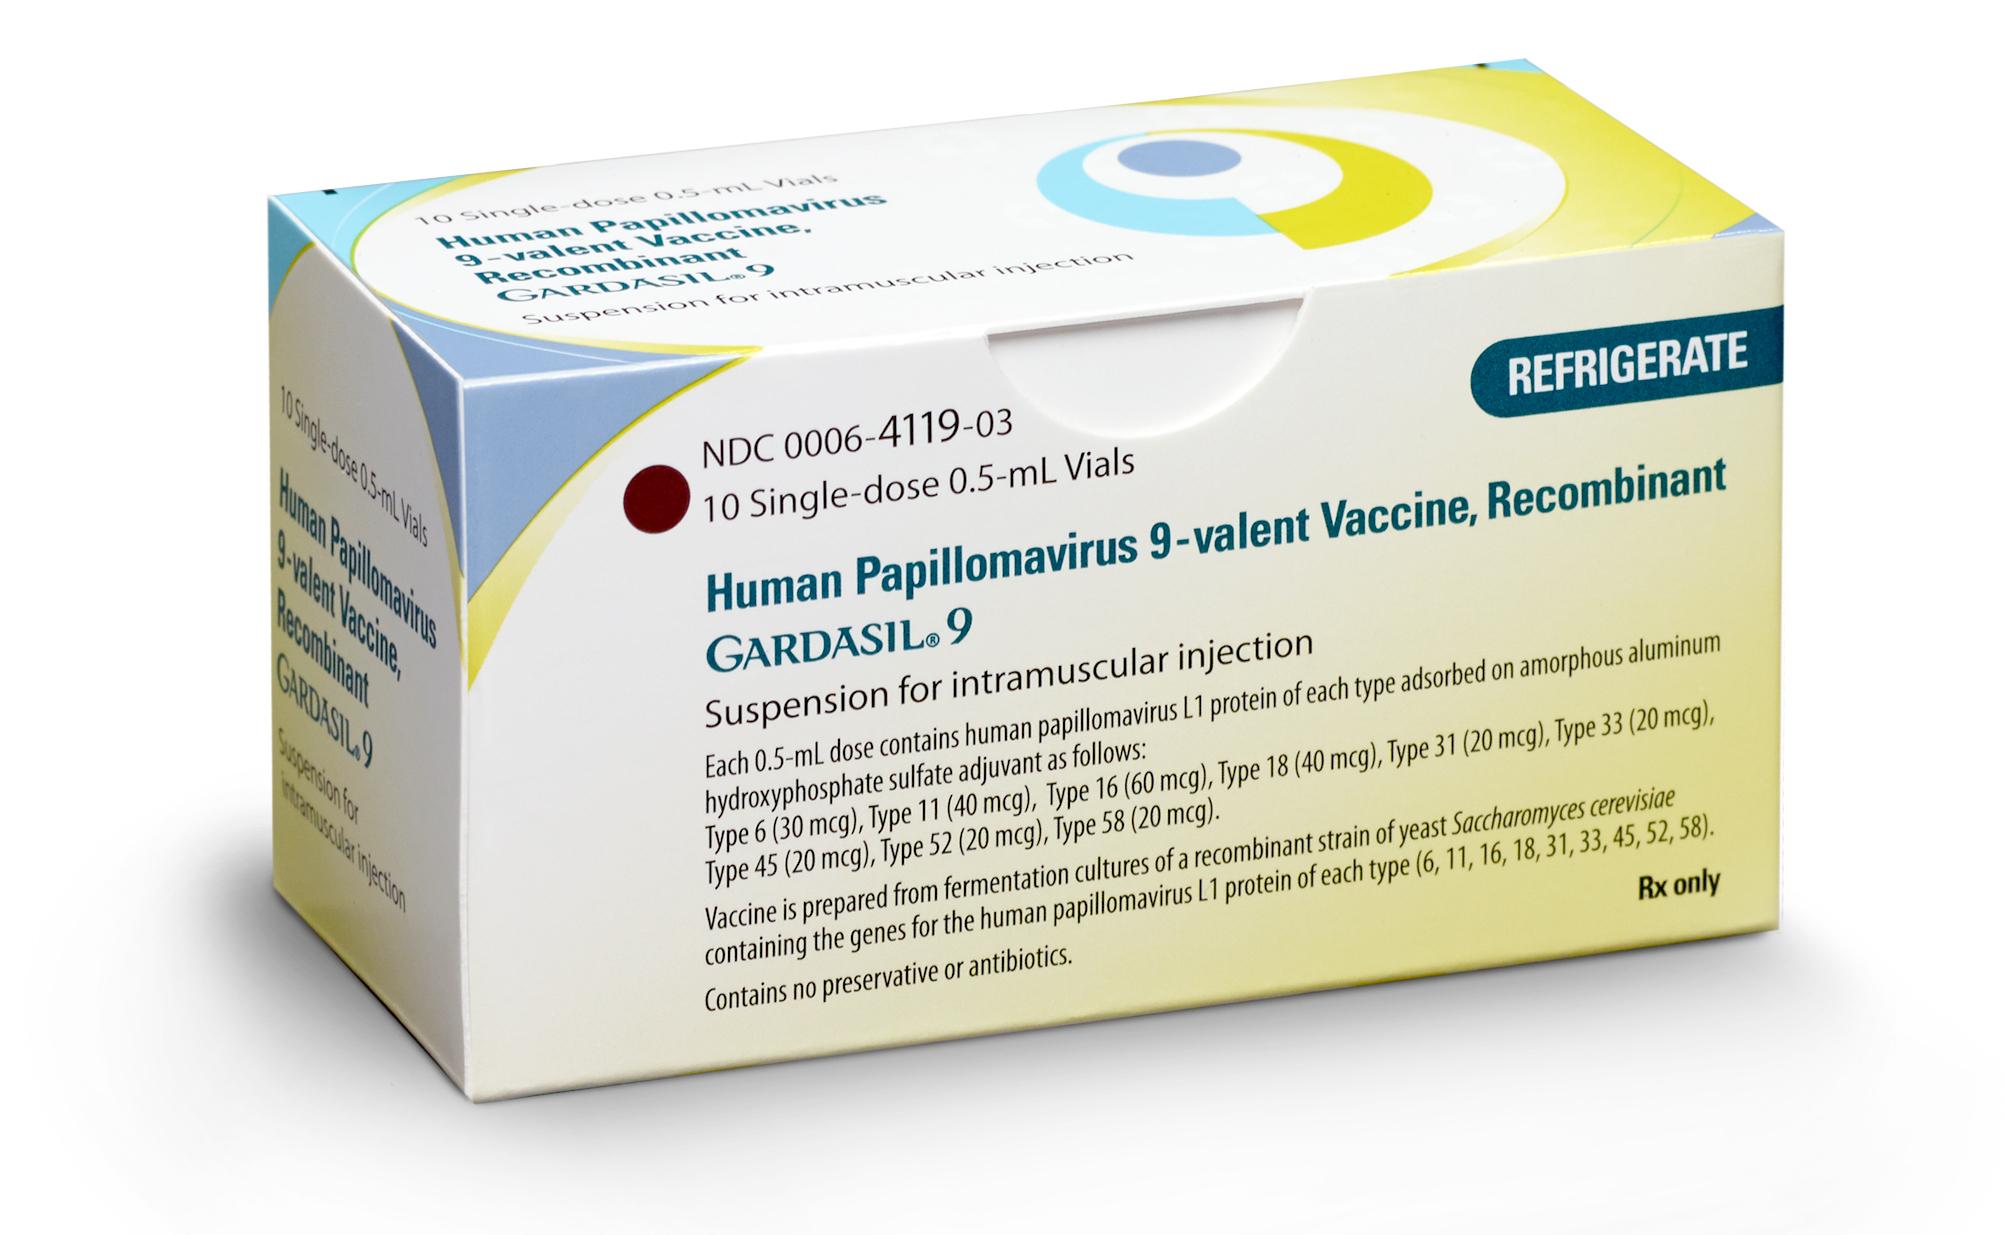 human papillomavirus 9 valent vaccine recombinant)